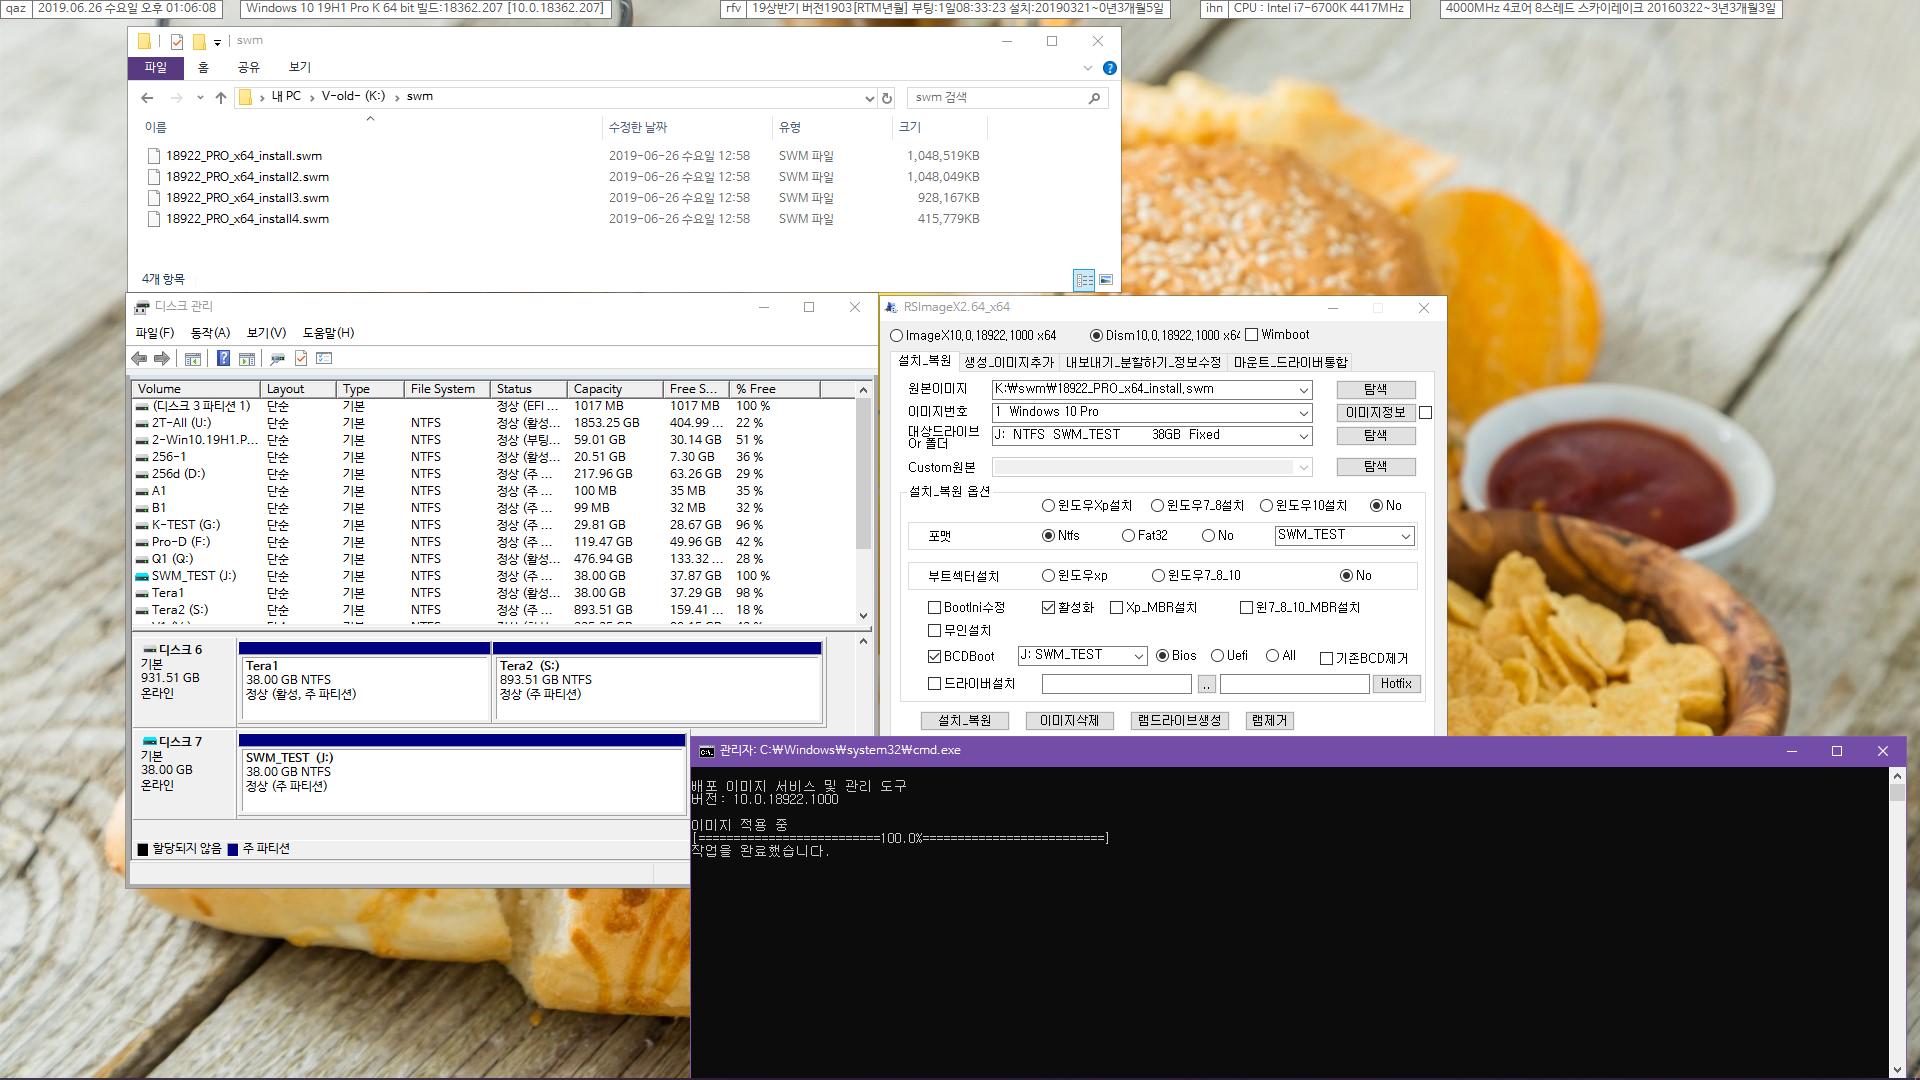 RSImageX로 swm 파일 설치 테스트 - ImageX로는 에러가 생겨도 DISM 으로 하면 swm 설치 되네요 2019-06-26_130608.png